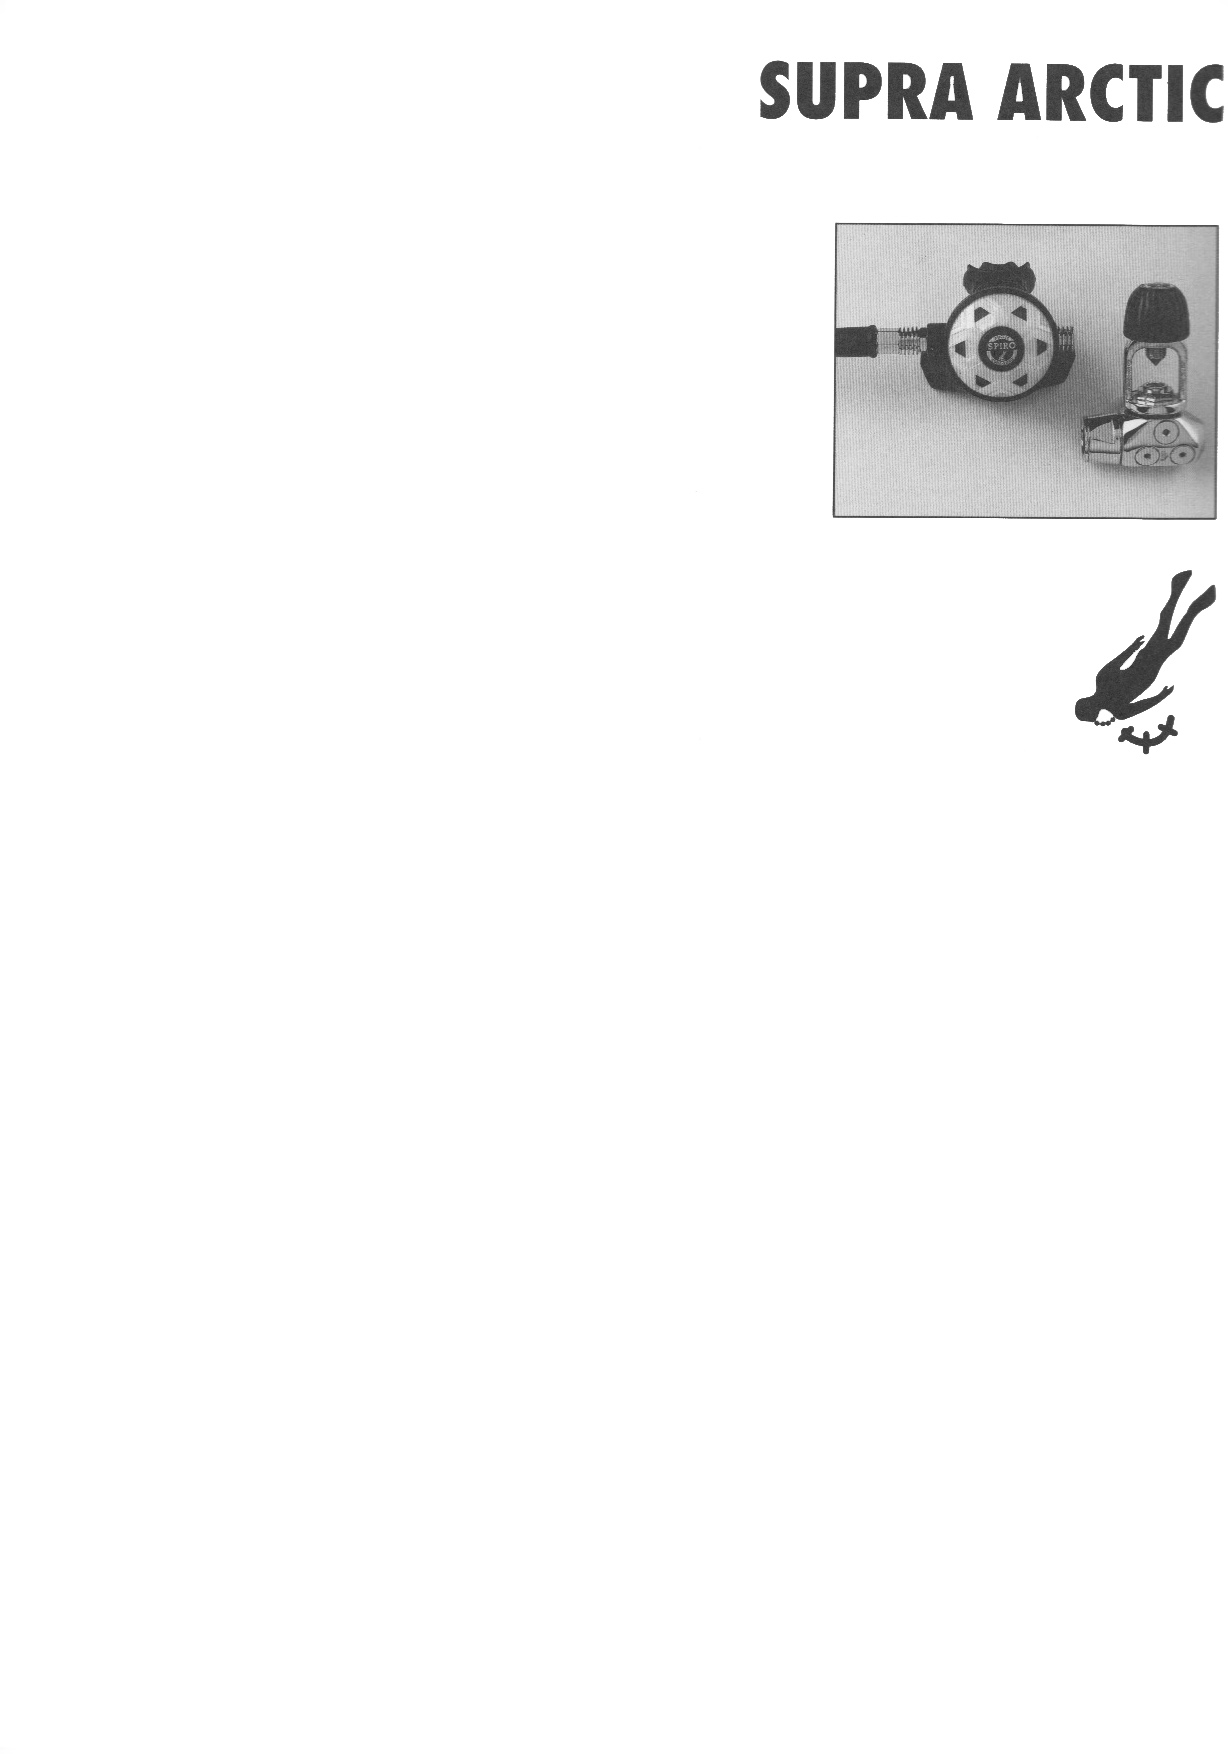 ARTIC91.1.19.jpg